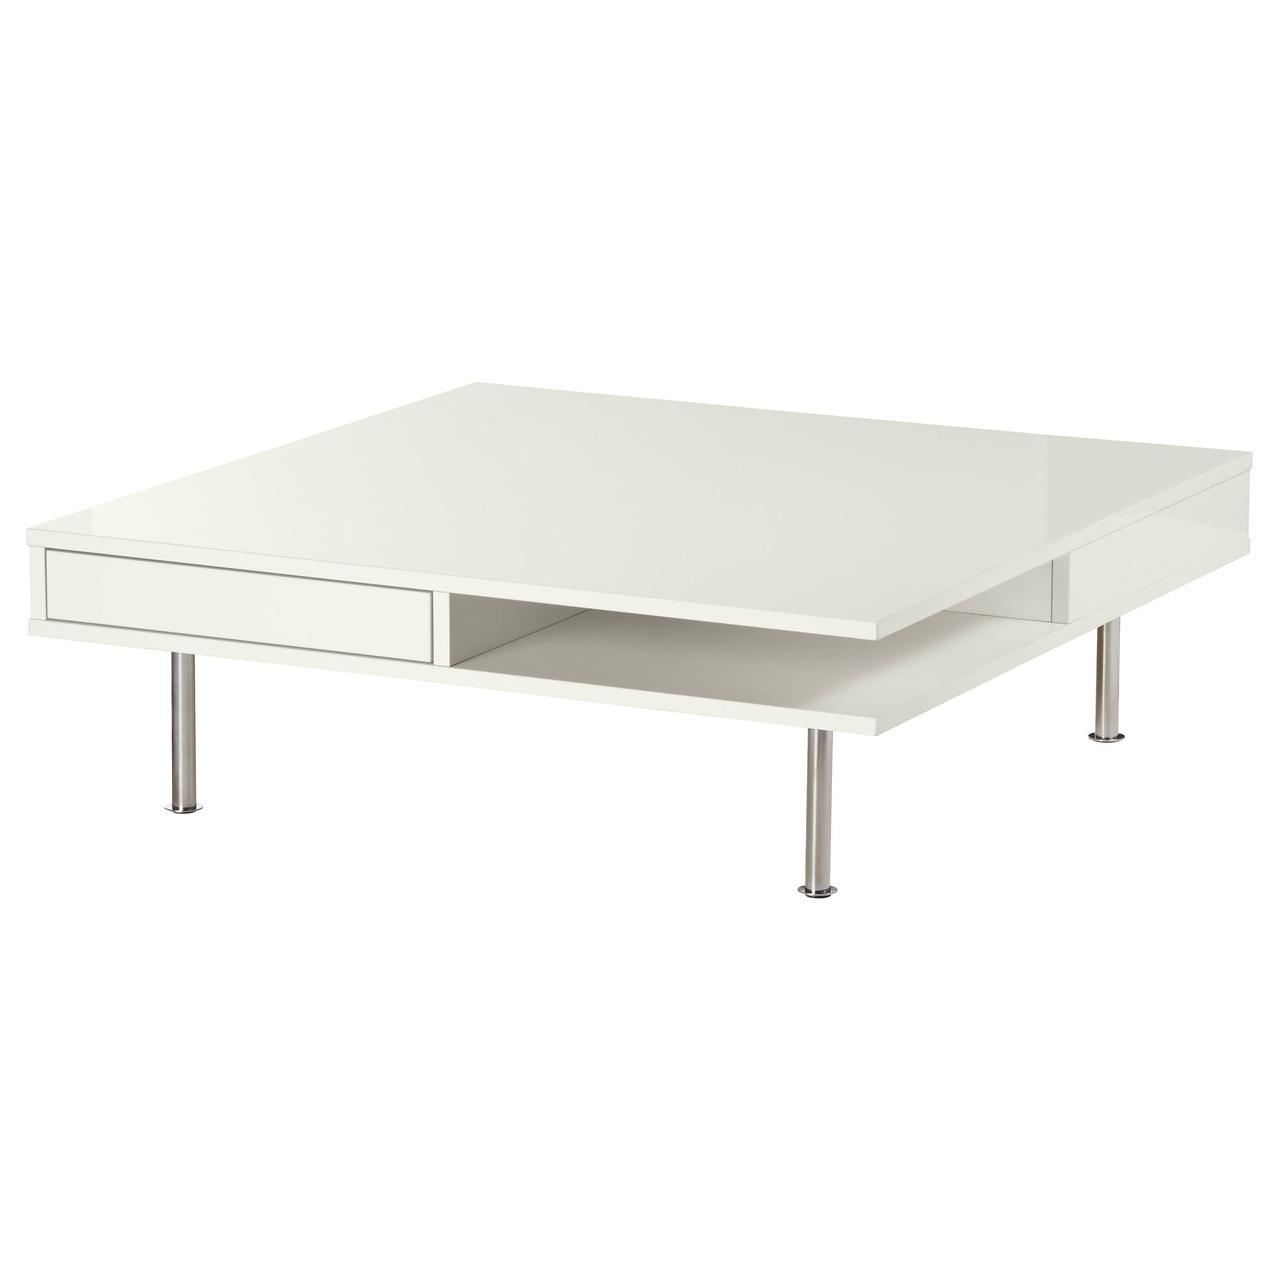 IKEA TOFTERYD (901.974.84) Журнальний столик